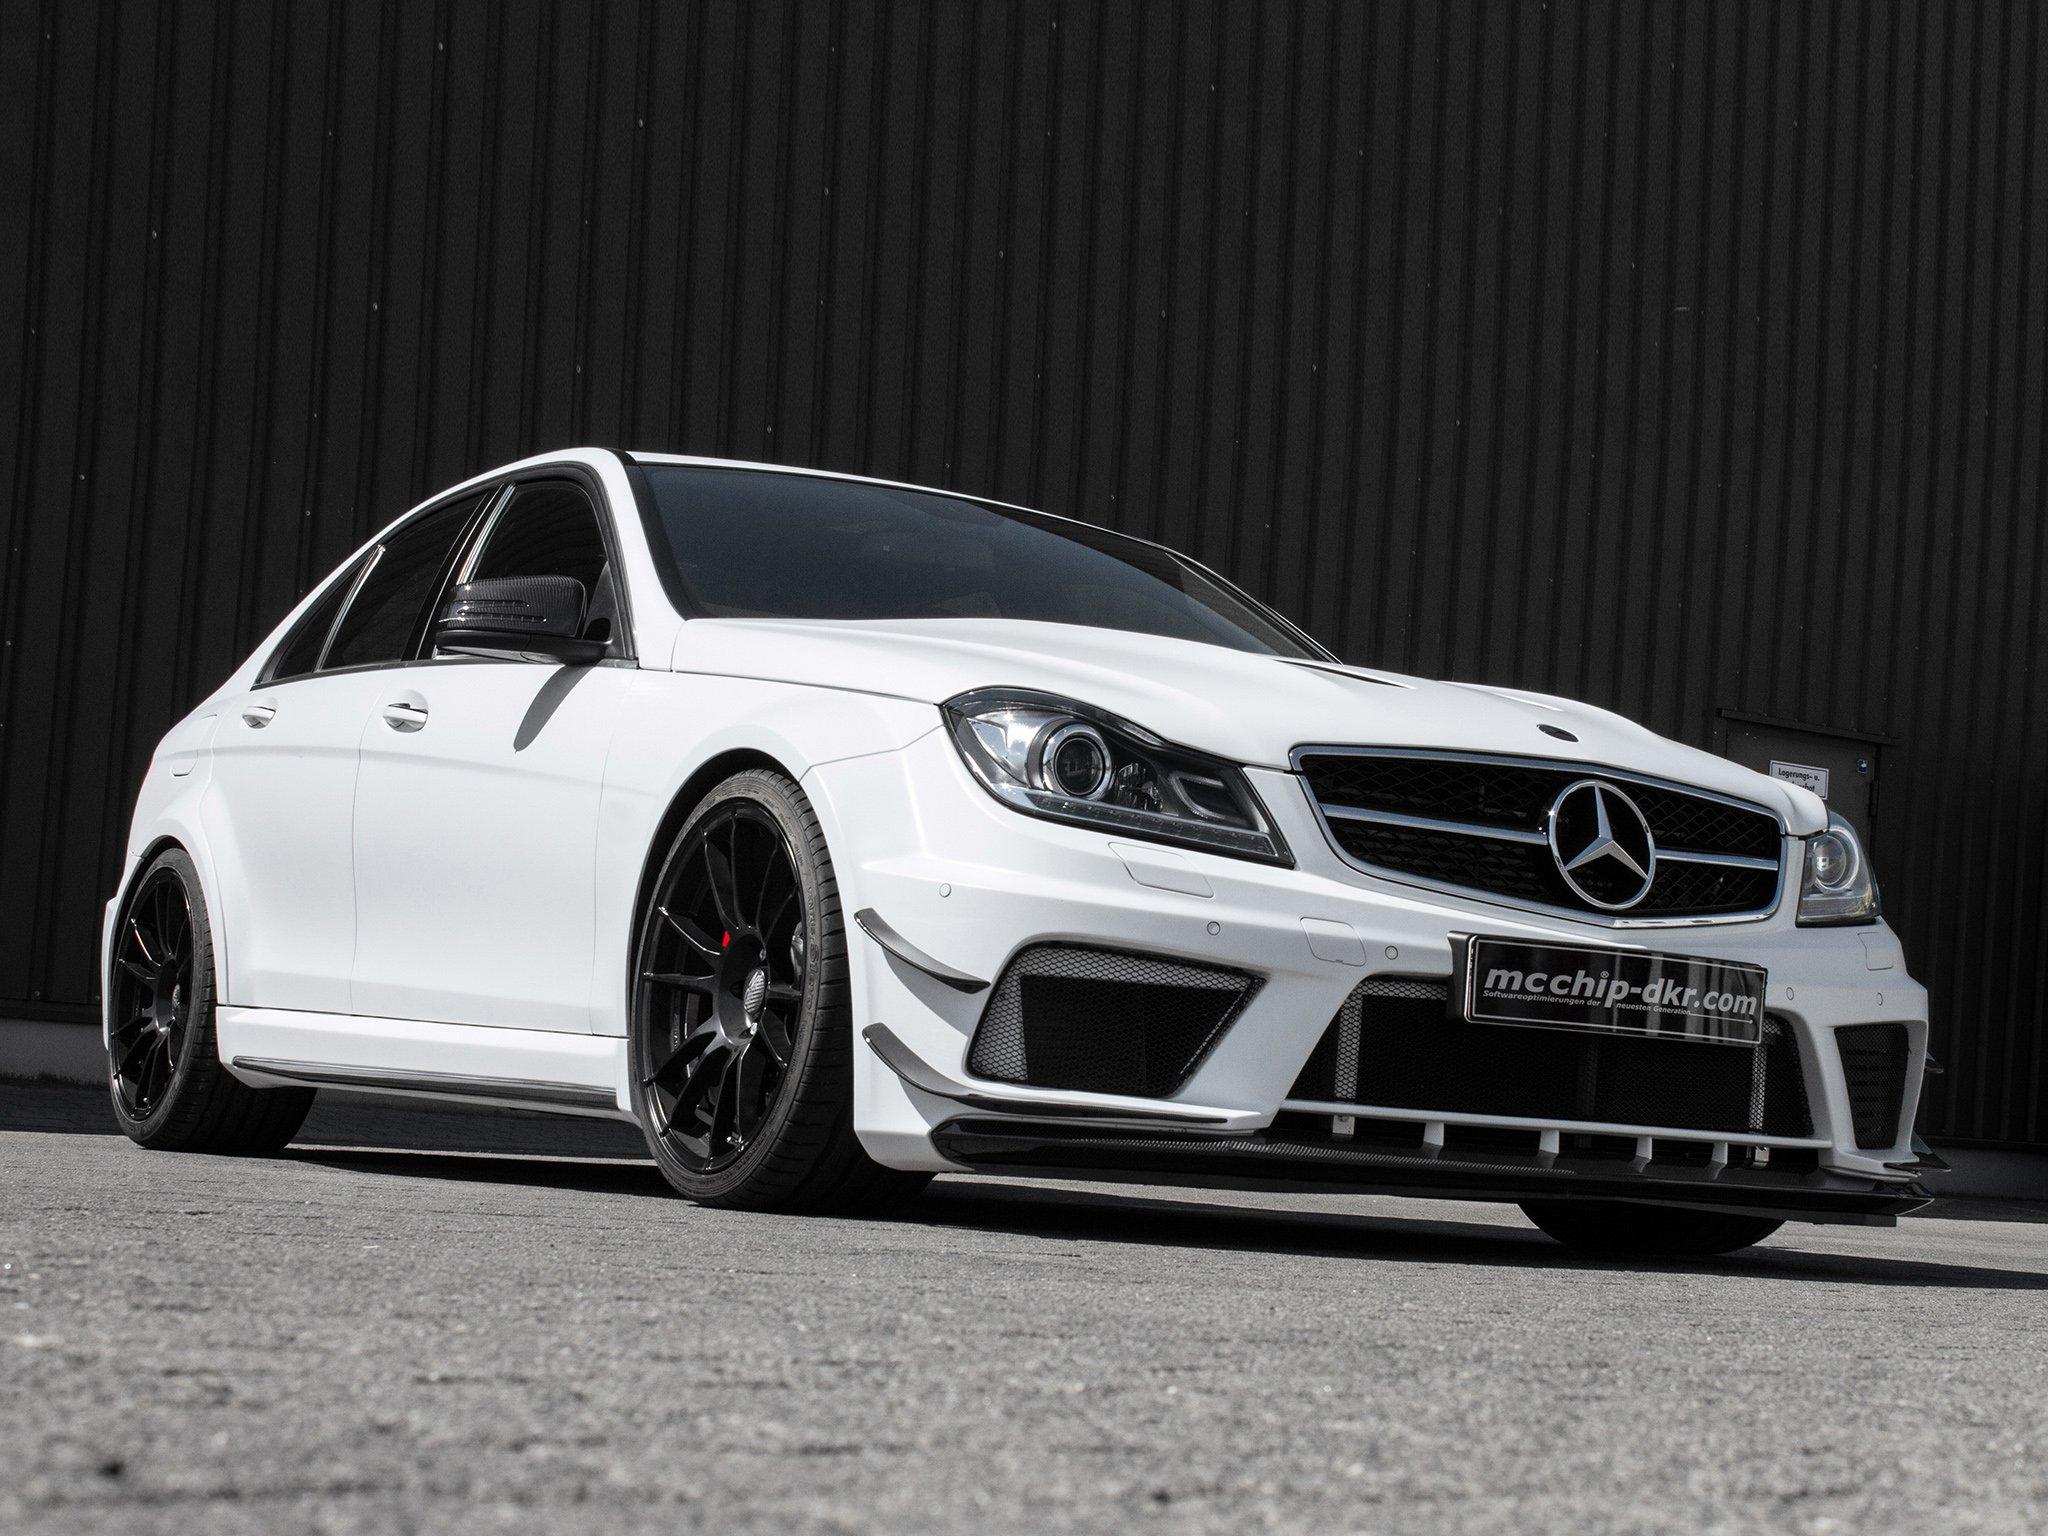 Тюнинг автомобилей Mercedes C-class кузов W2 4